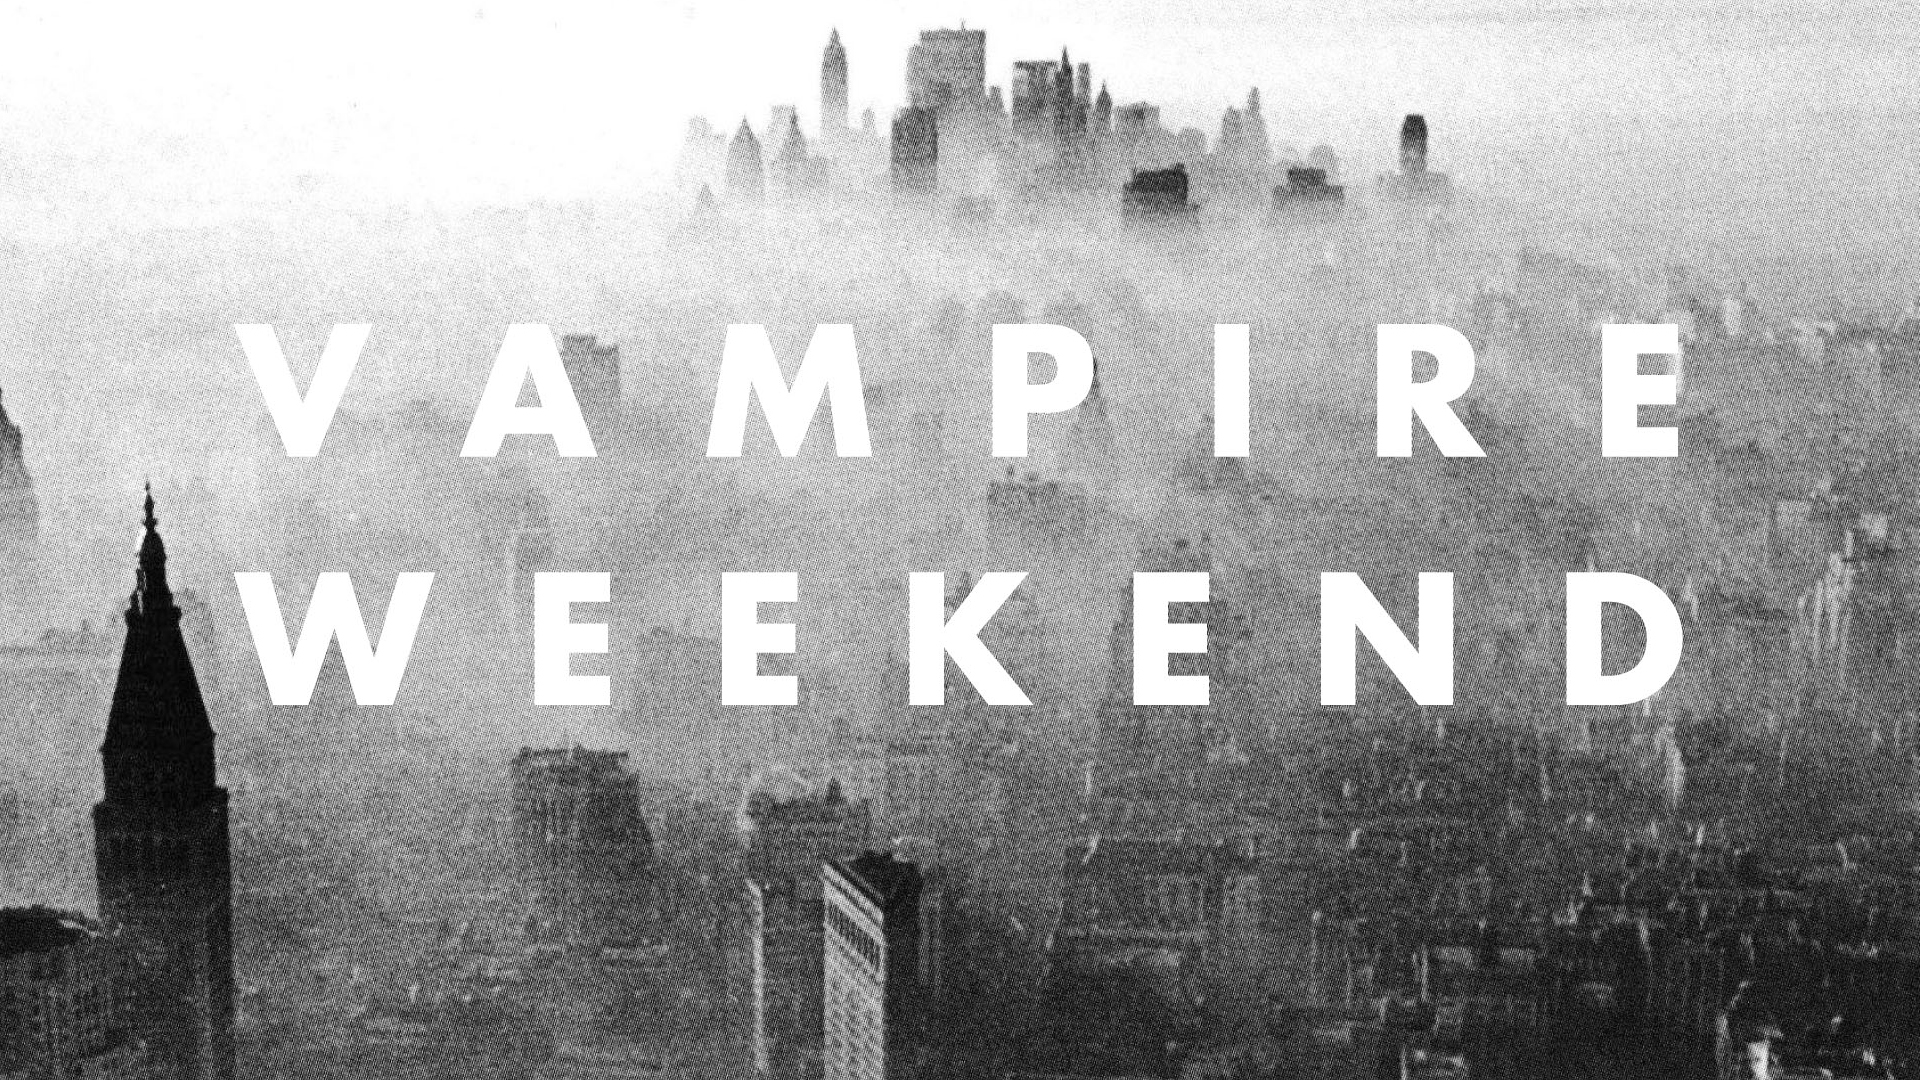 Vampire Weekend - Wikipedia